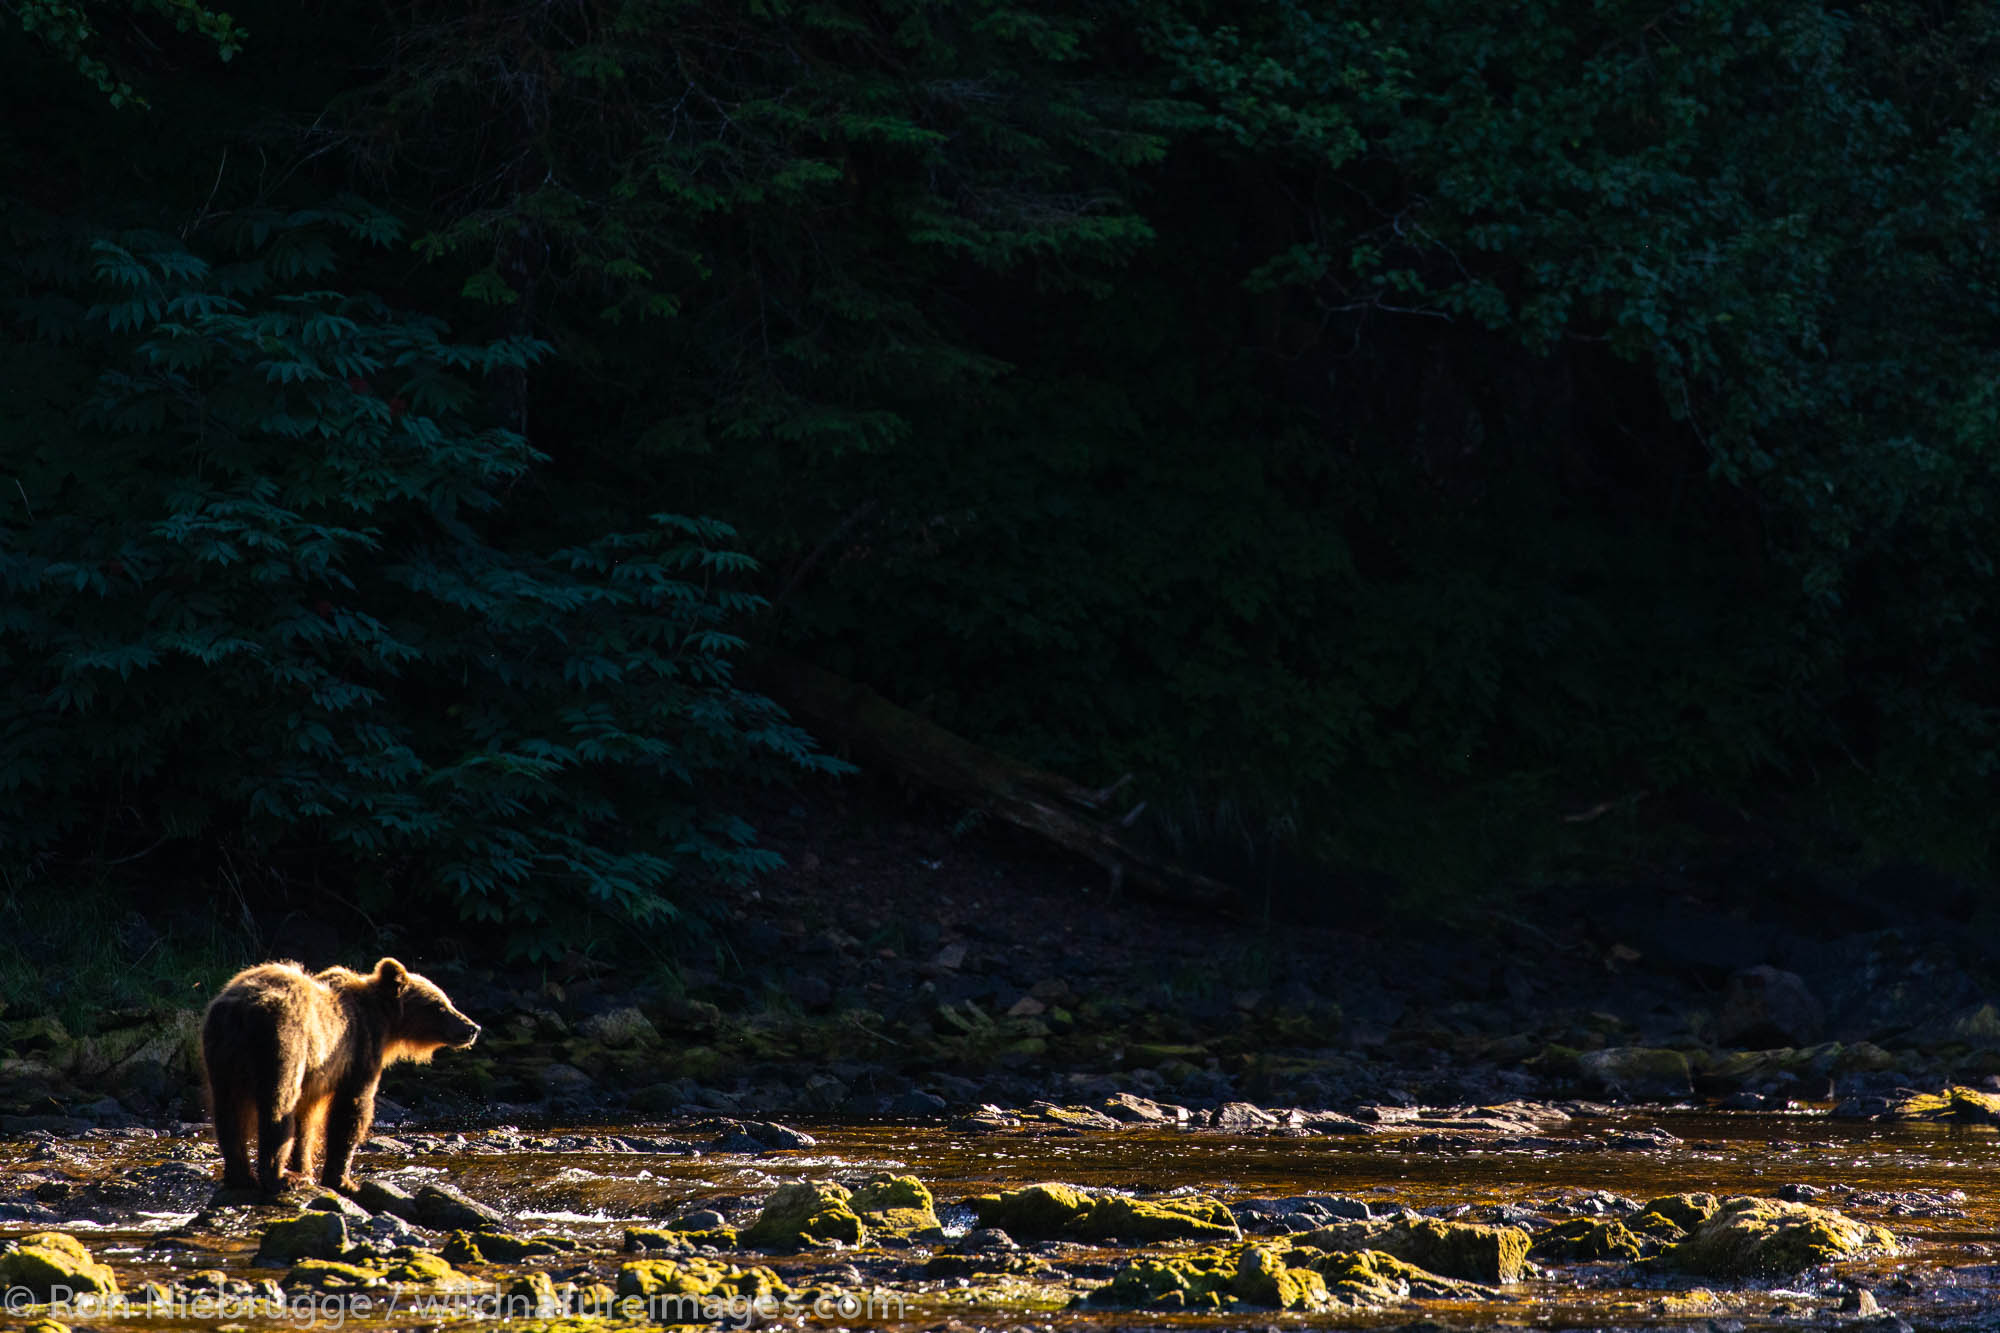 Brown beae, Chichagof Island, Tongass National Forest, Alaska.